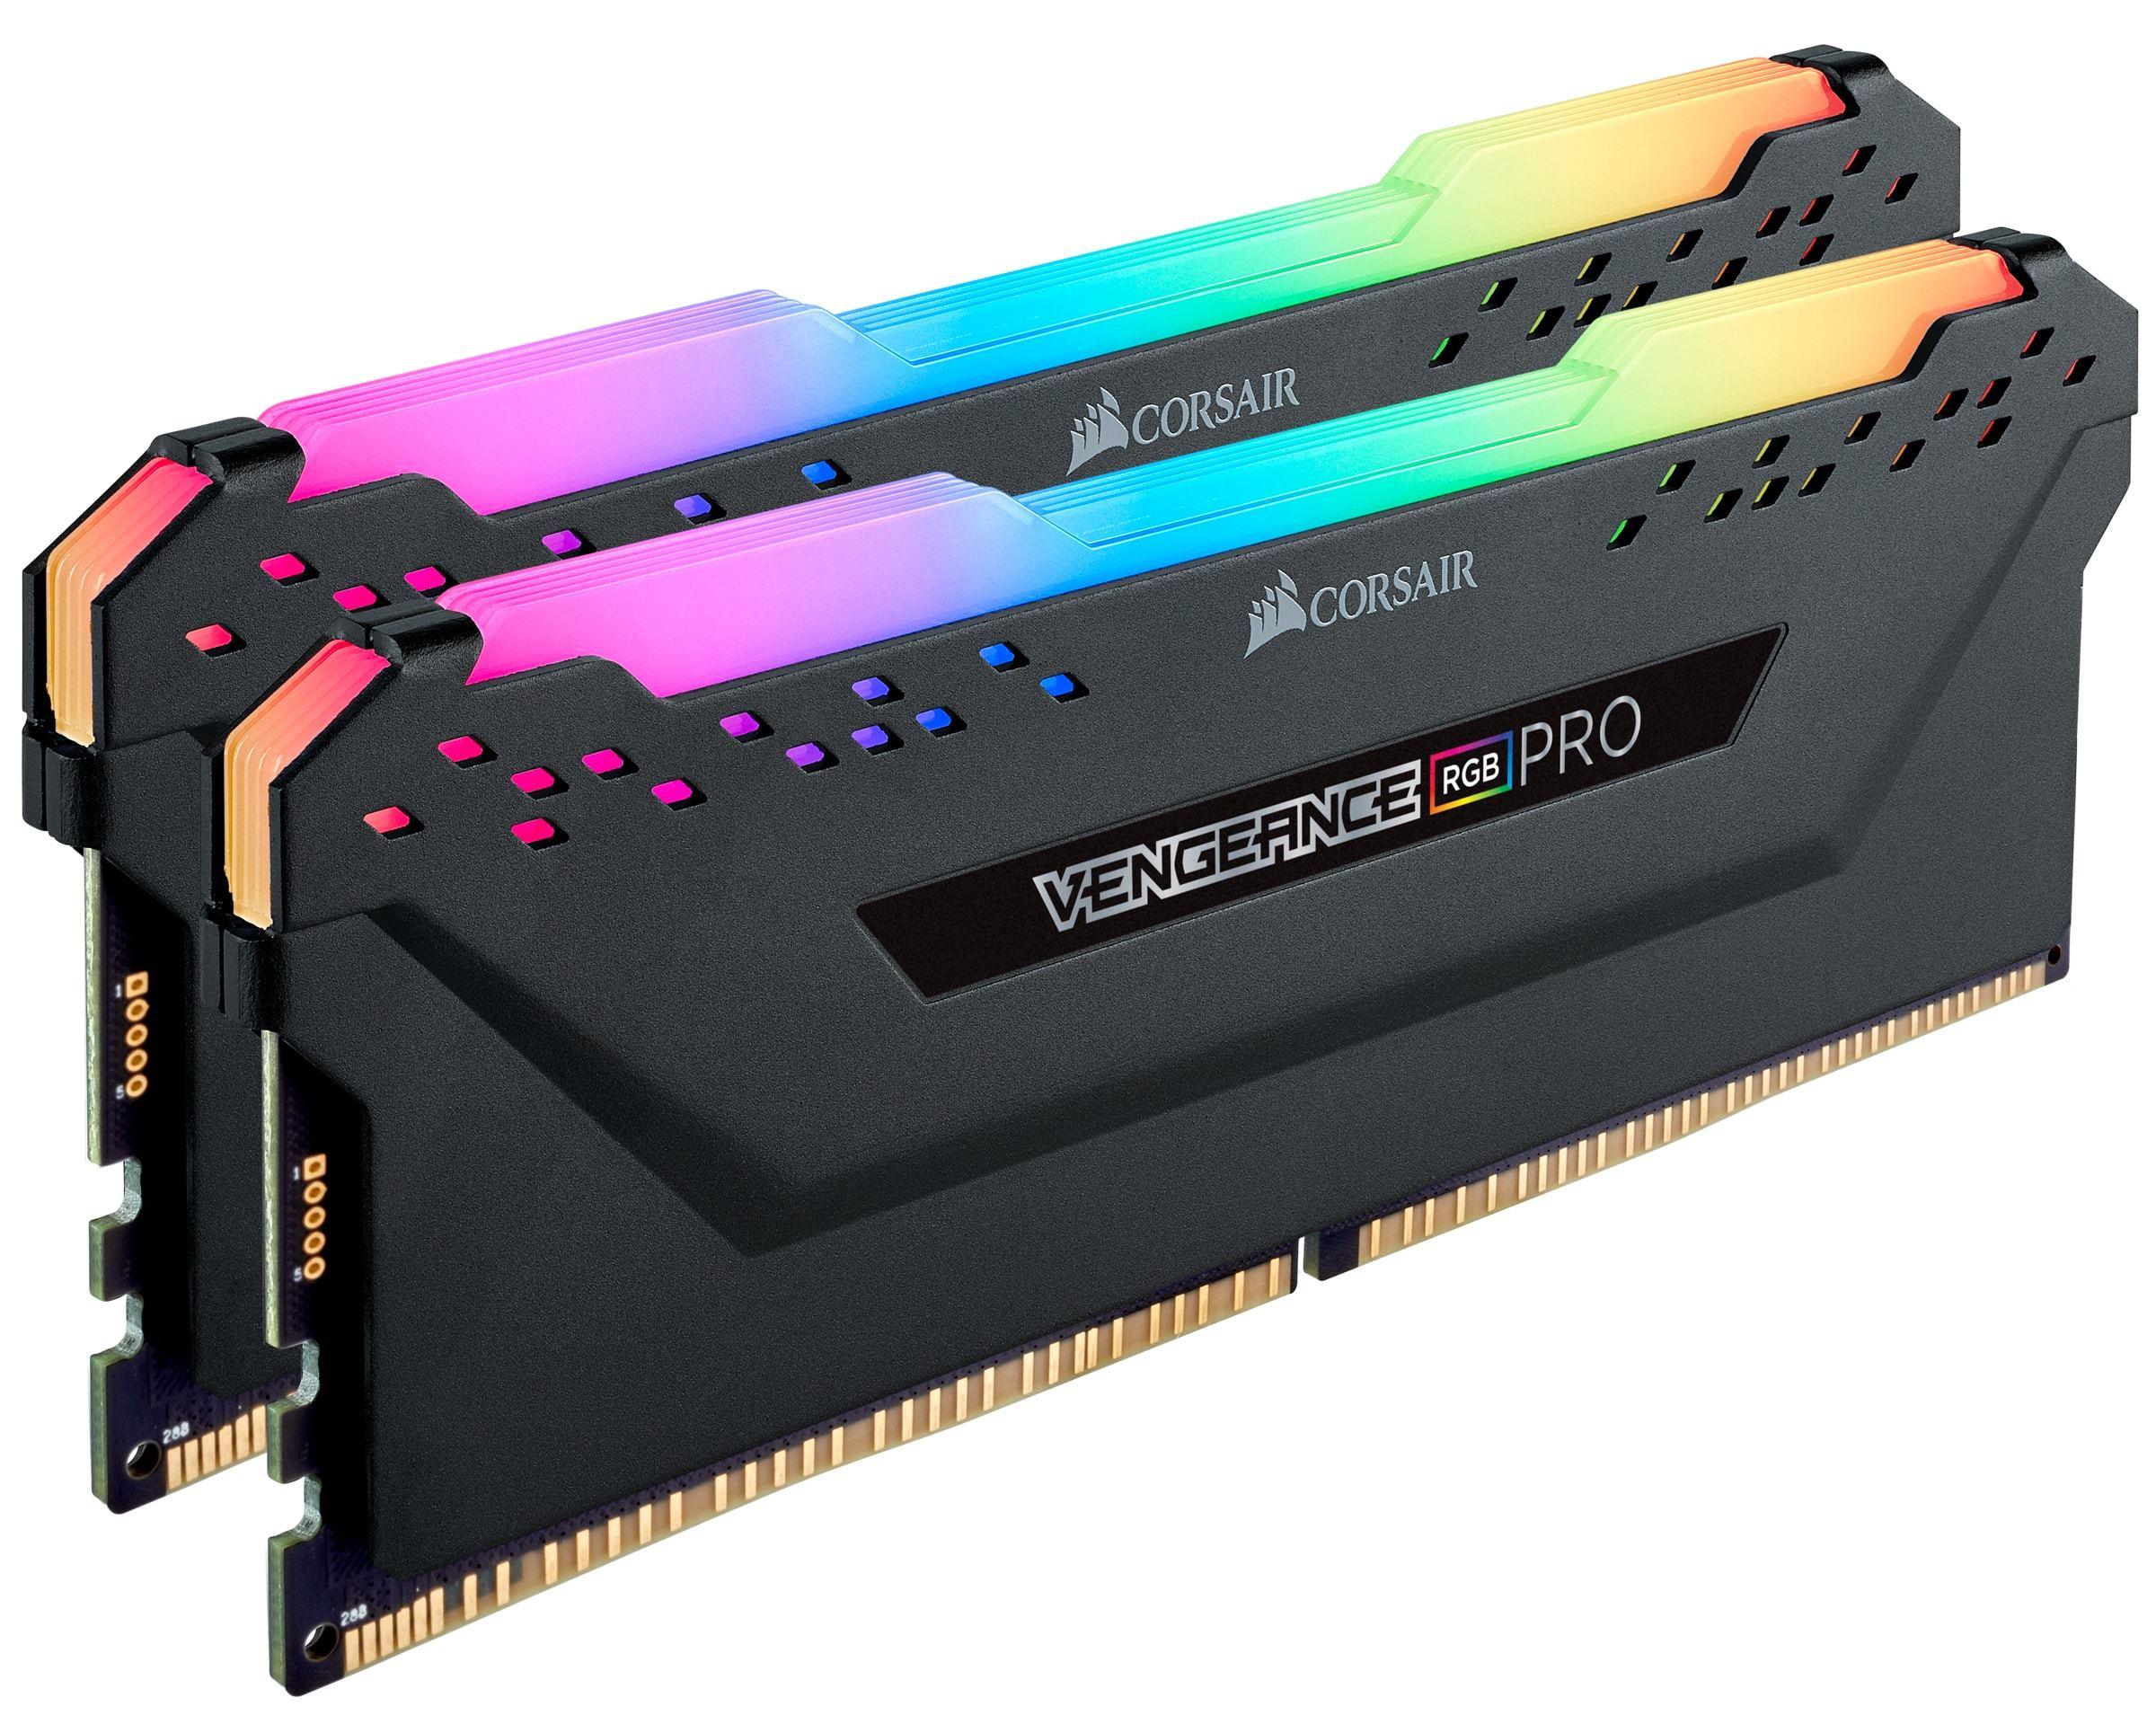 Vengeance RGB PRO FILLER MOD